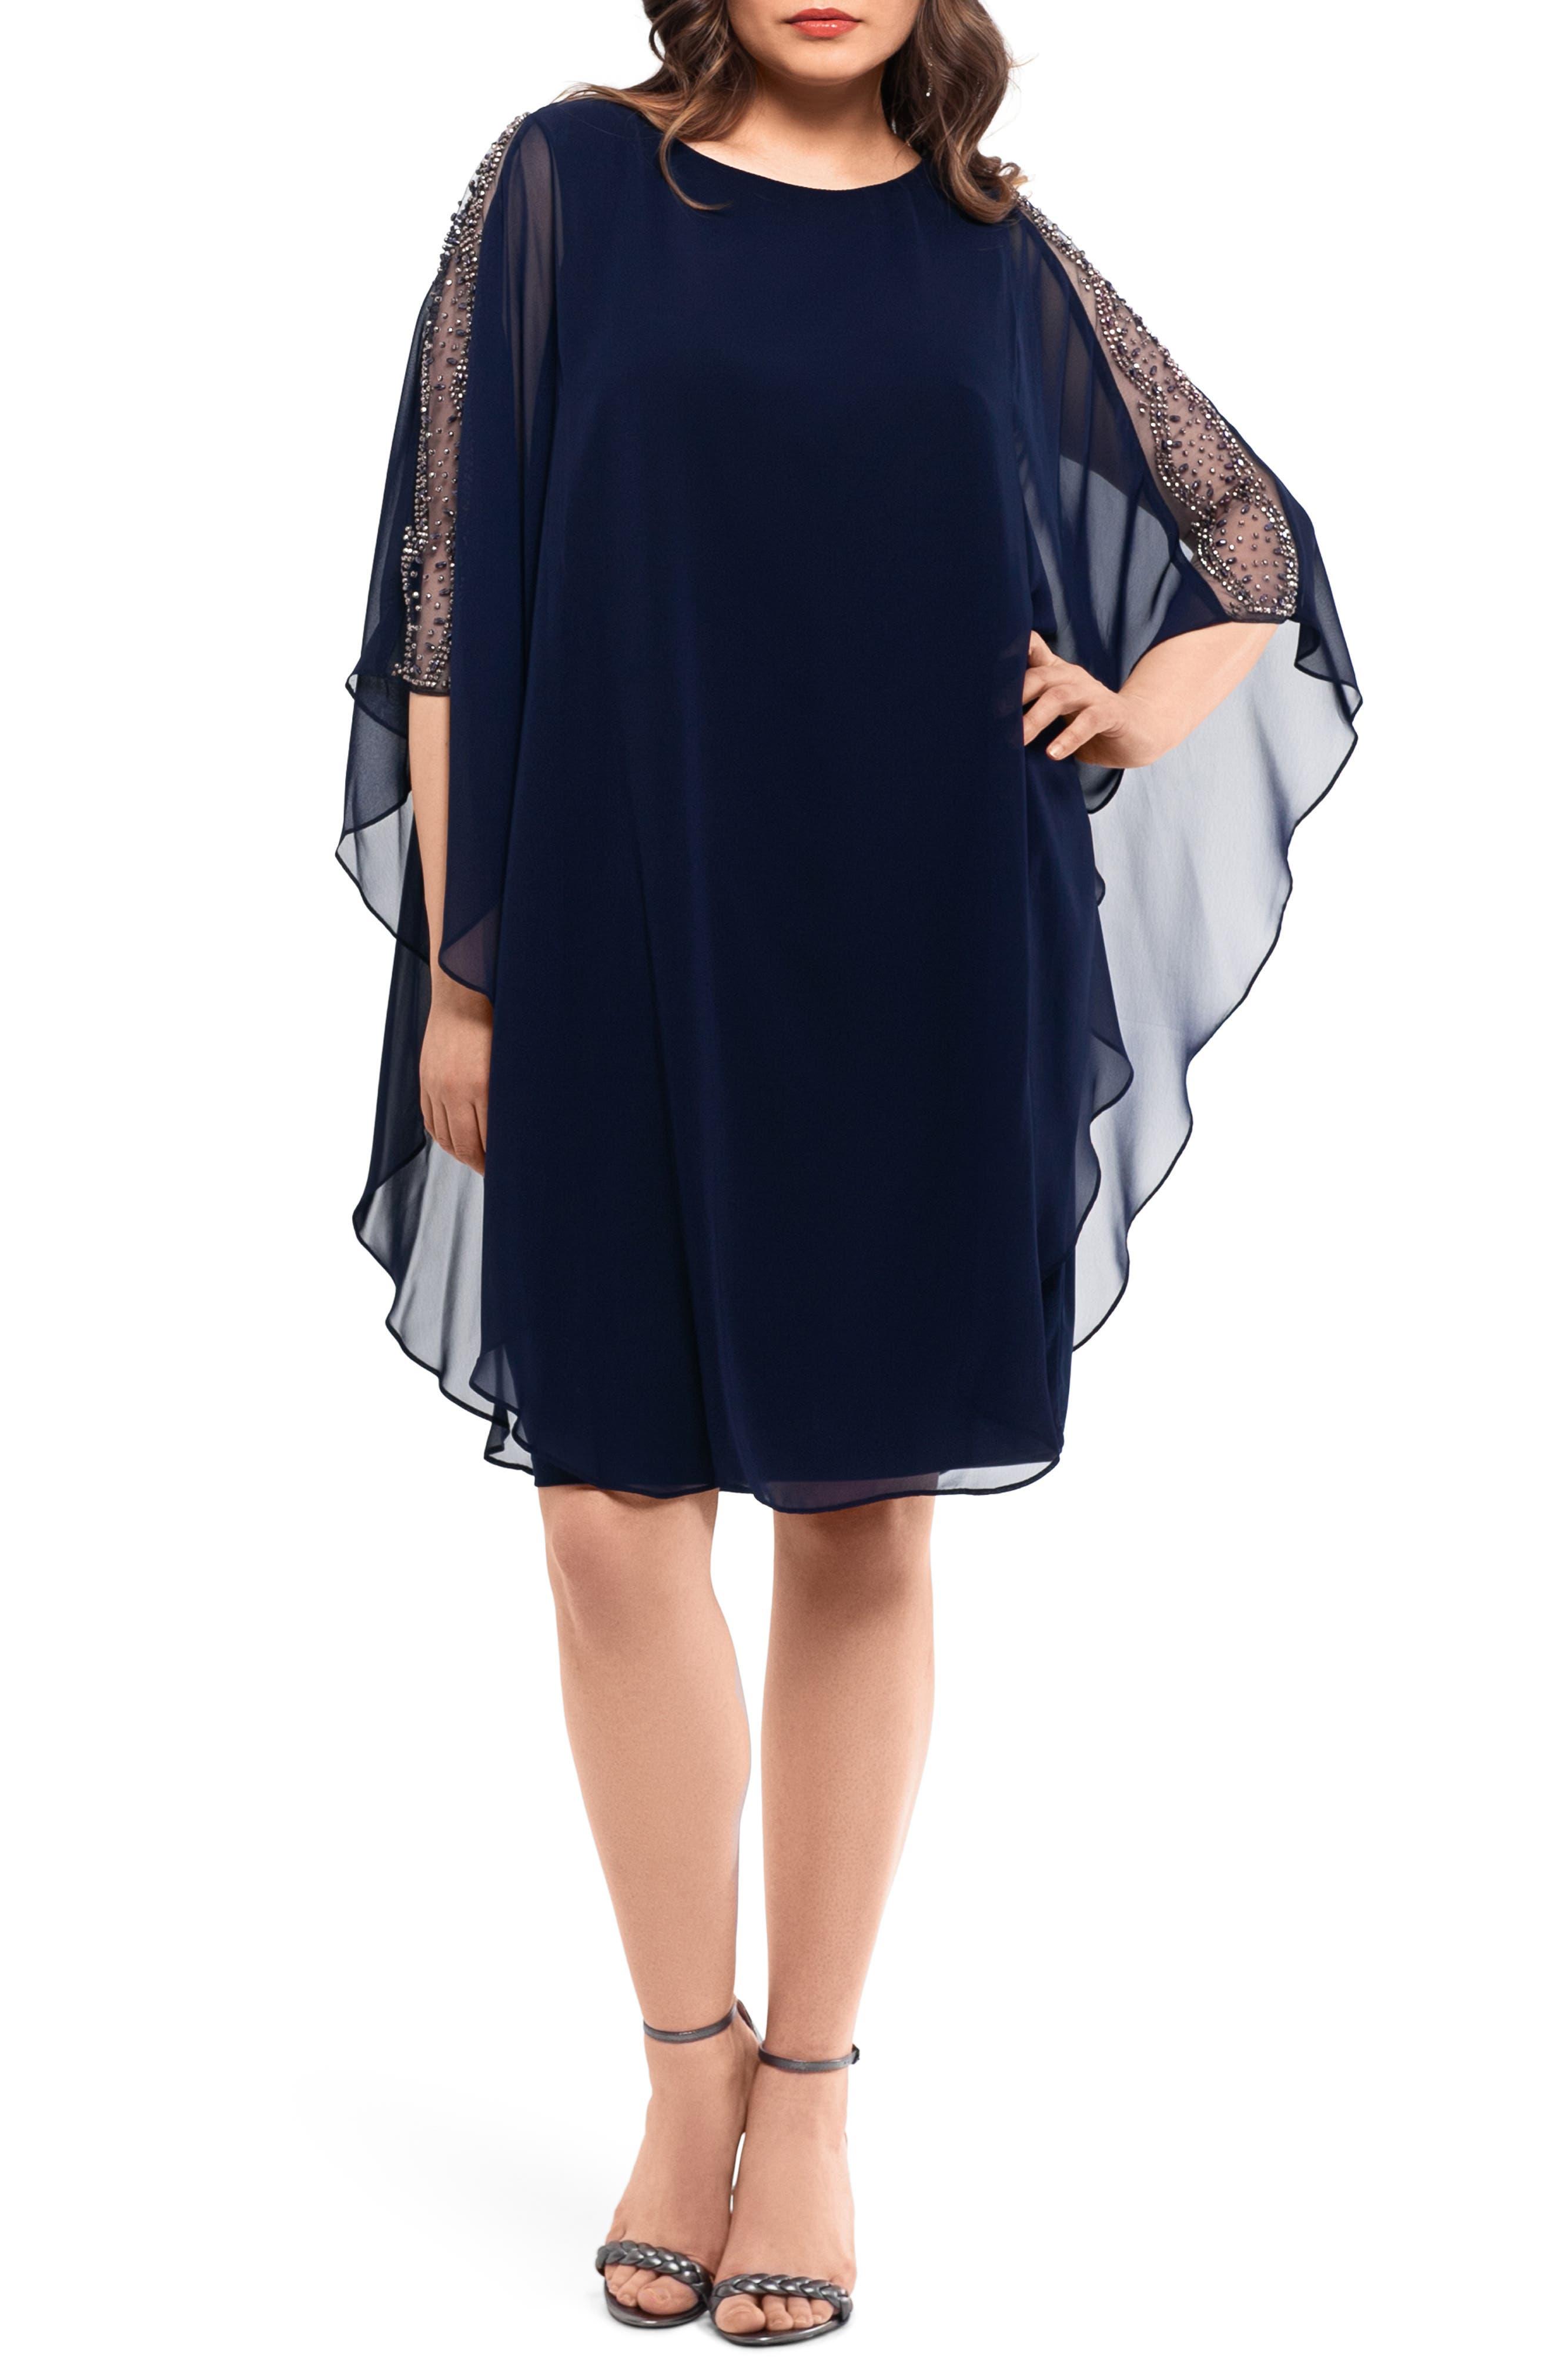 Plus Size Xscape Chiffon Overlay Beaded Sleeve Cocktail Dress, Blue